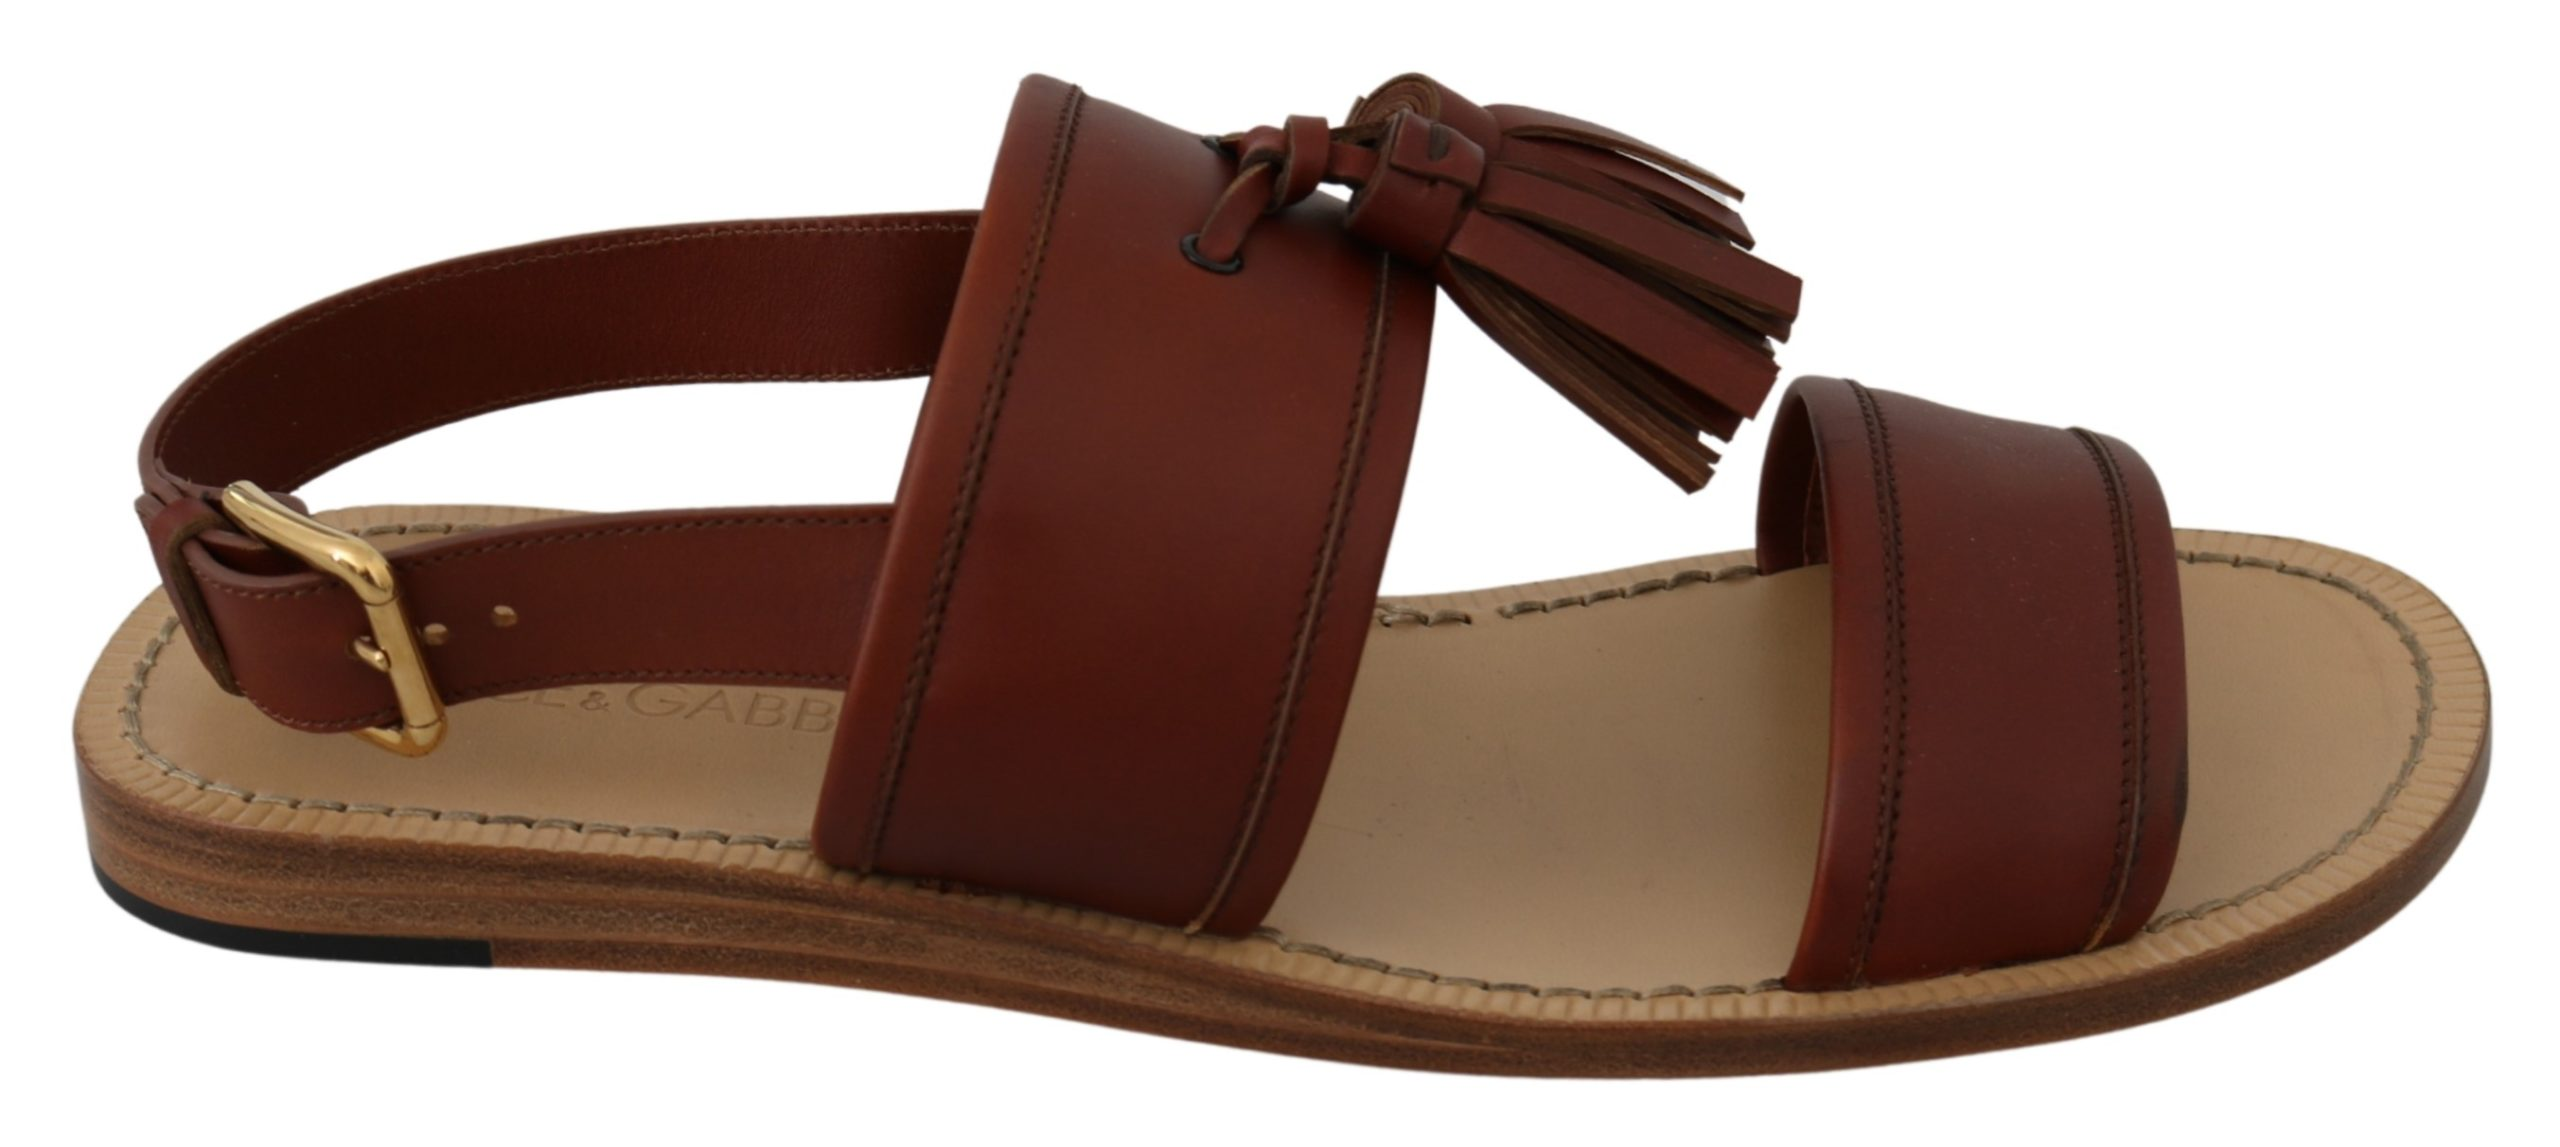 Dolce & Gabbana Men's Leather Buckle Sandal Brown MV3030 - EU43/US10